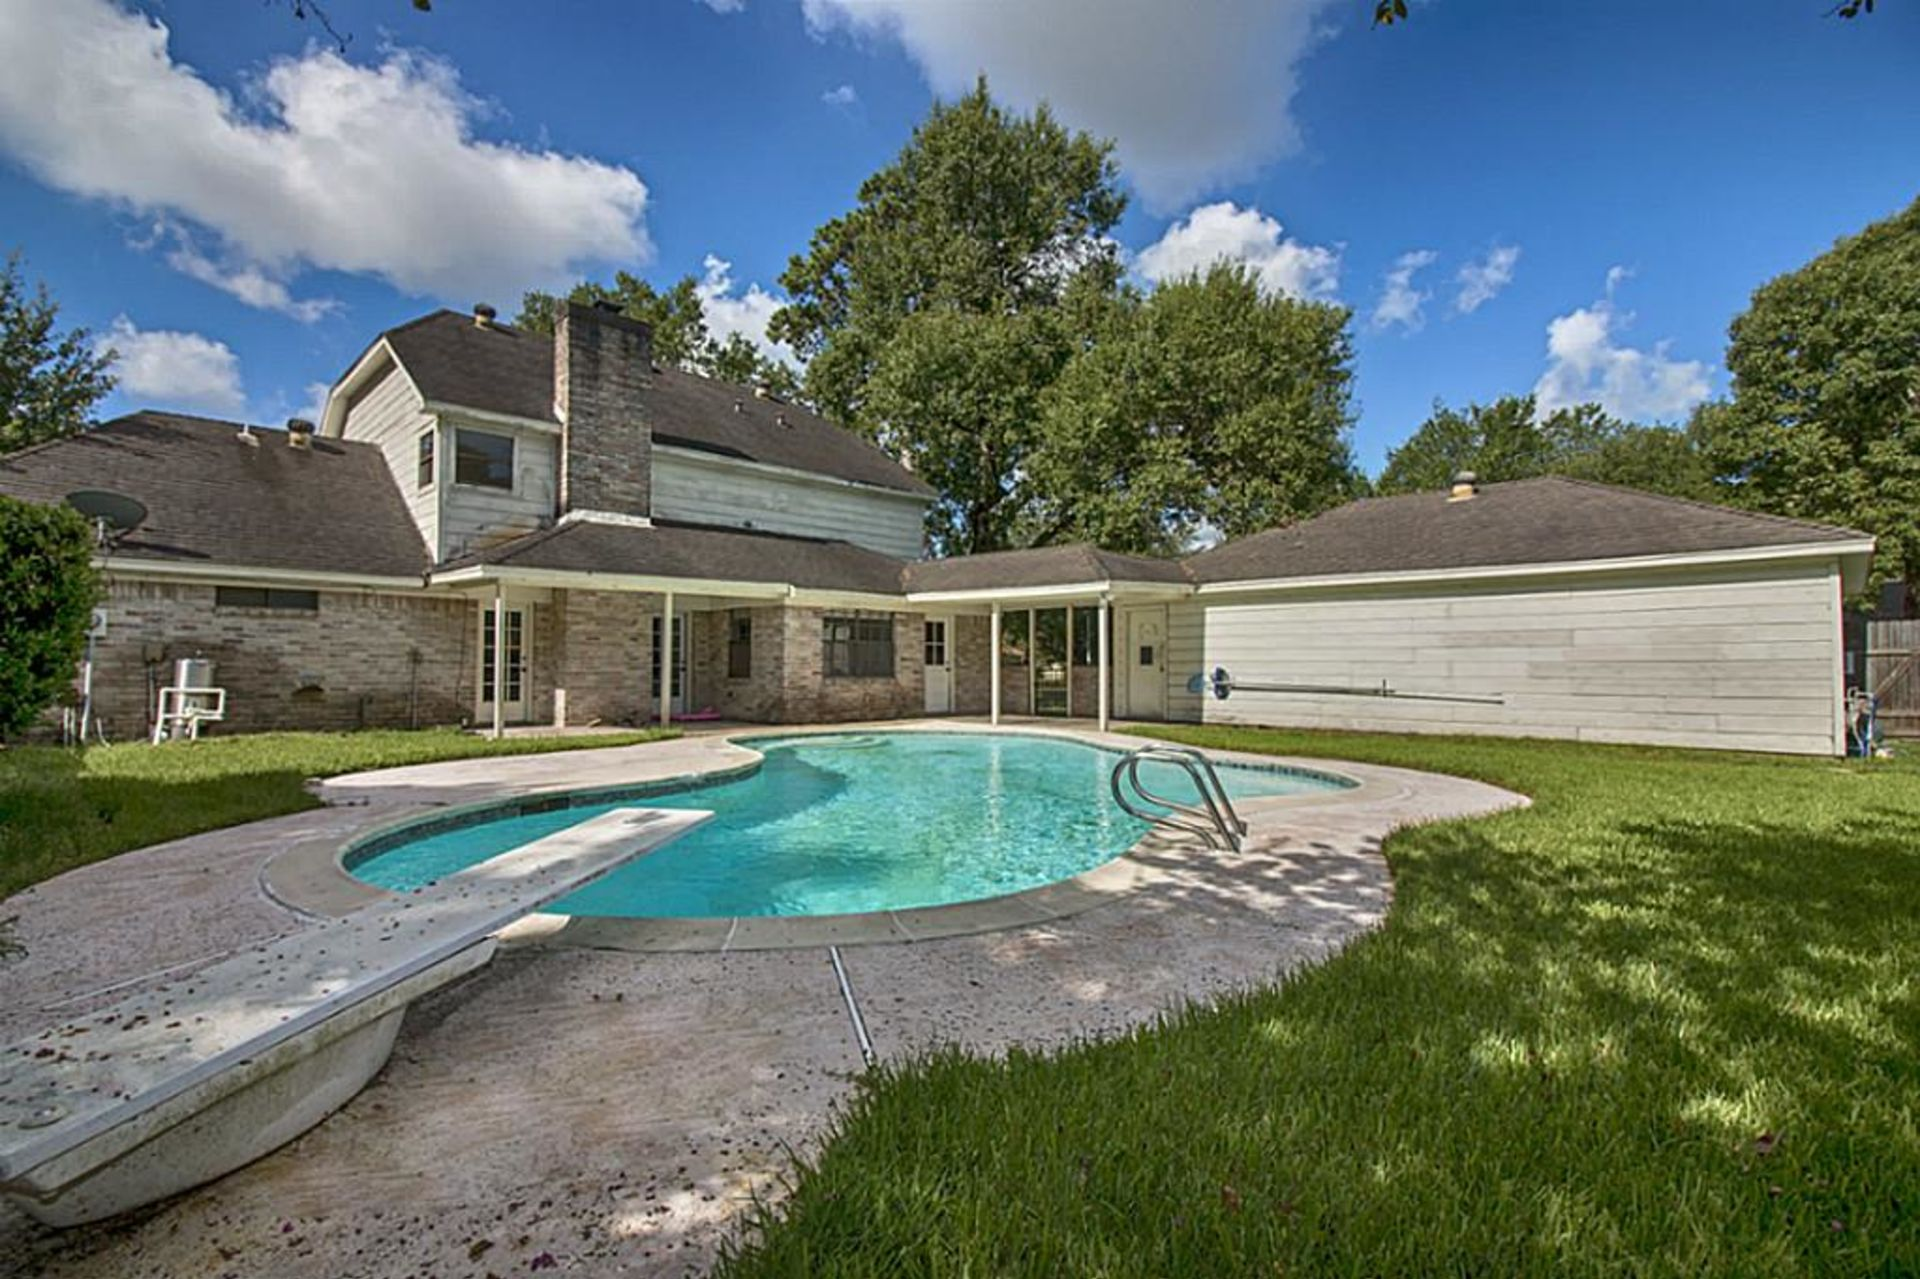 Atascocita Homes For Sale: 7703 12th Fairway Lane Texas 77346